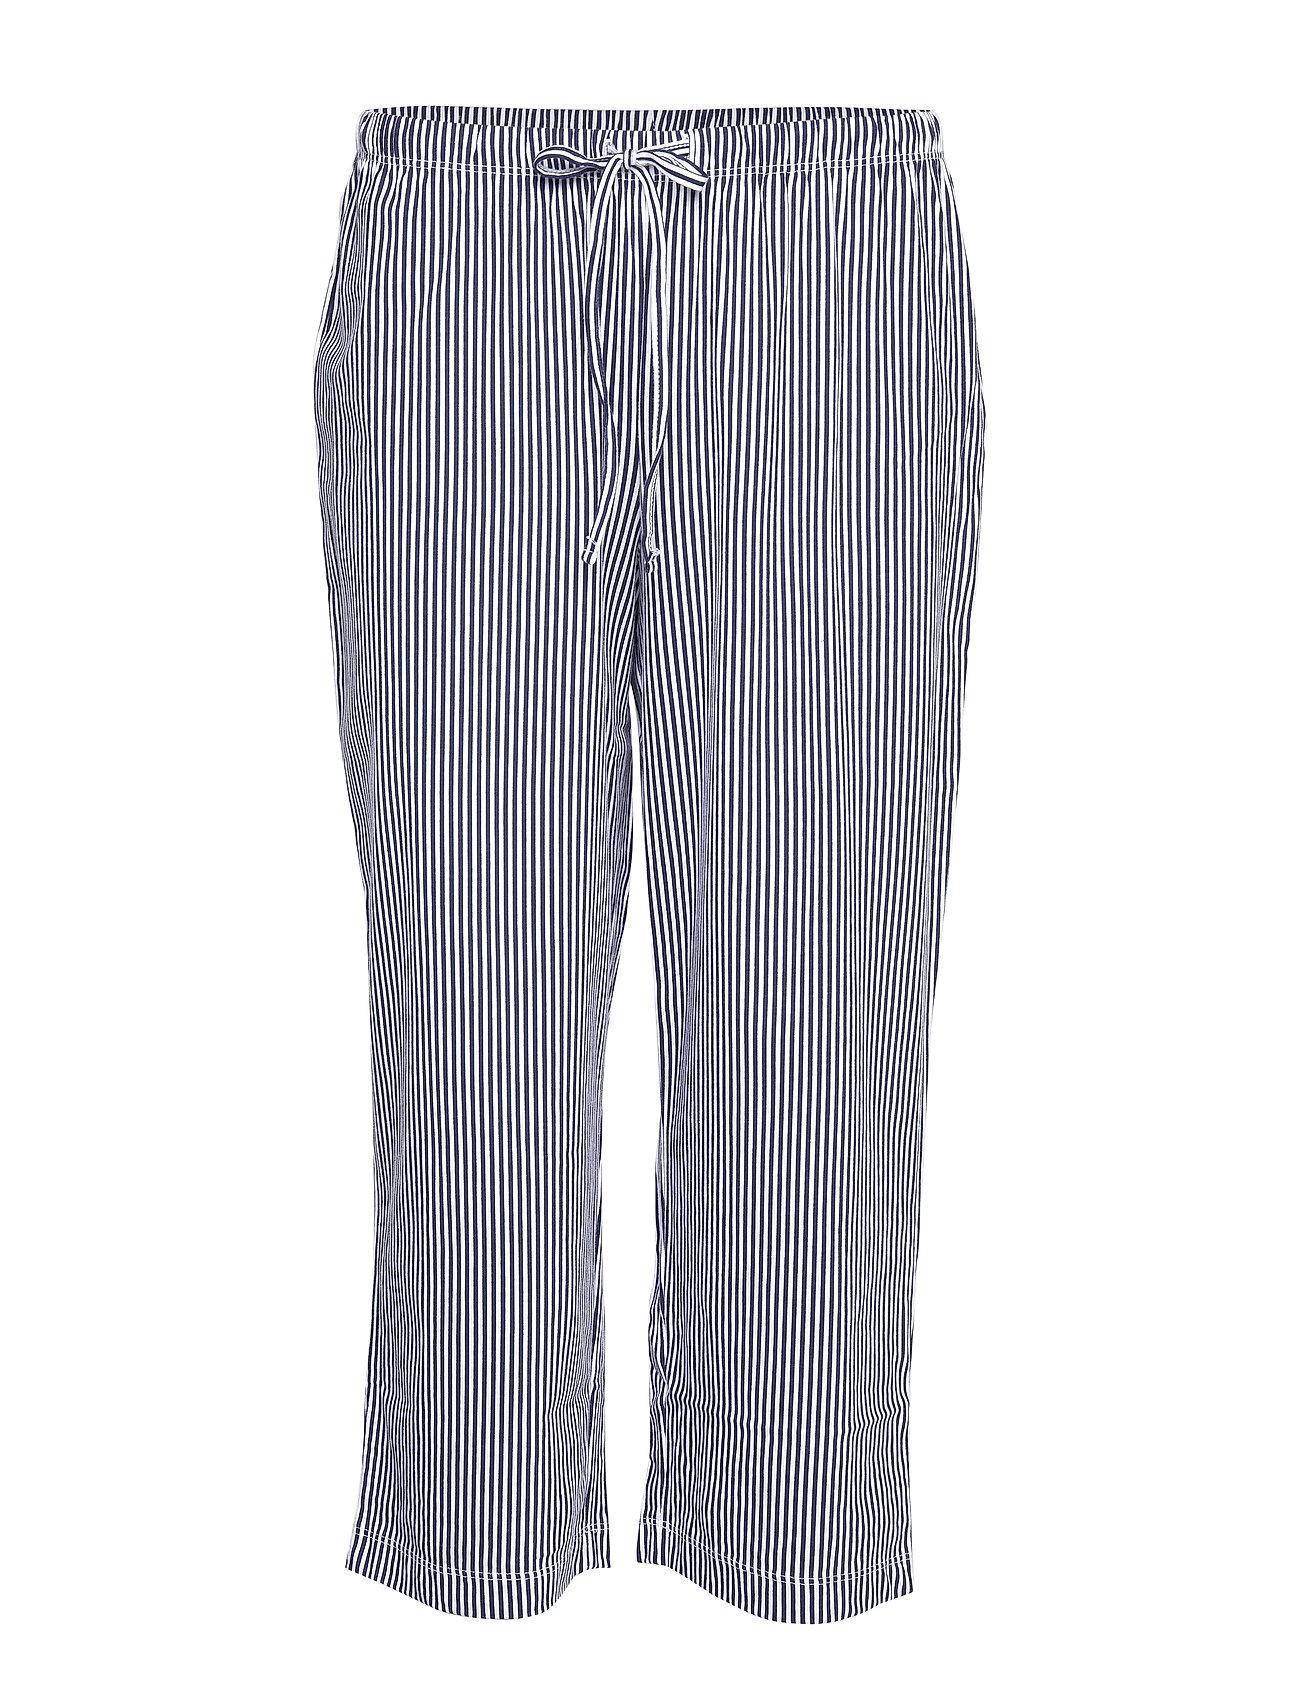 3 Sl Lrl Homewear 4 white Navy Classic StripeLauren Pj Setwindsor Heritage Ralph Notch Yy6gfbvI7